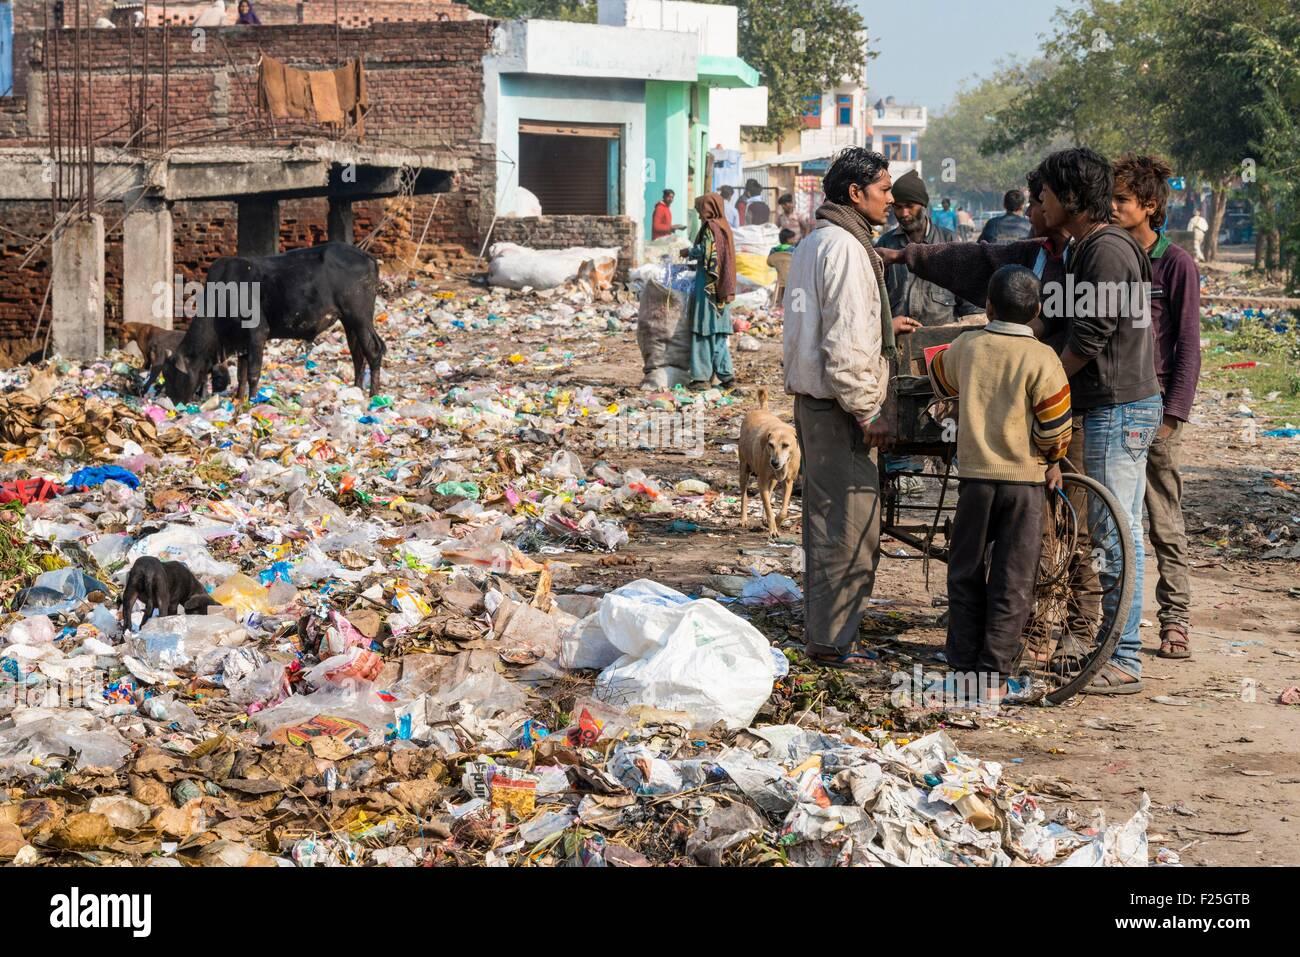 India, Uttar Pradesh state, Agra, street garbage - Stock Image